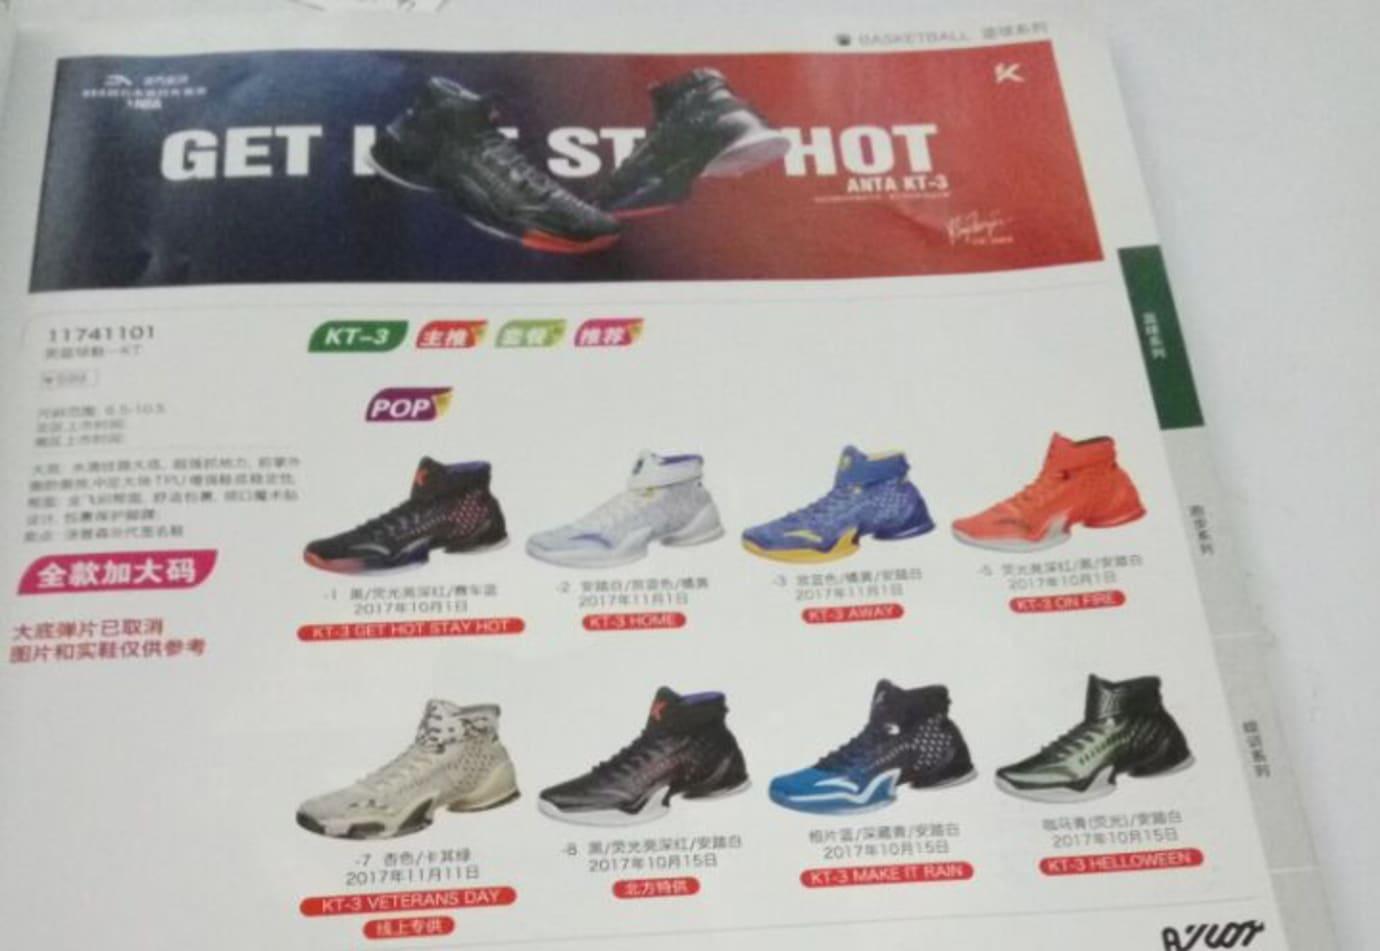 ANTA KT 3 Catalog